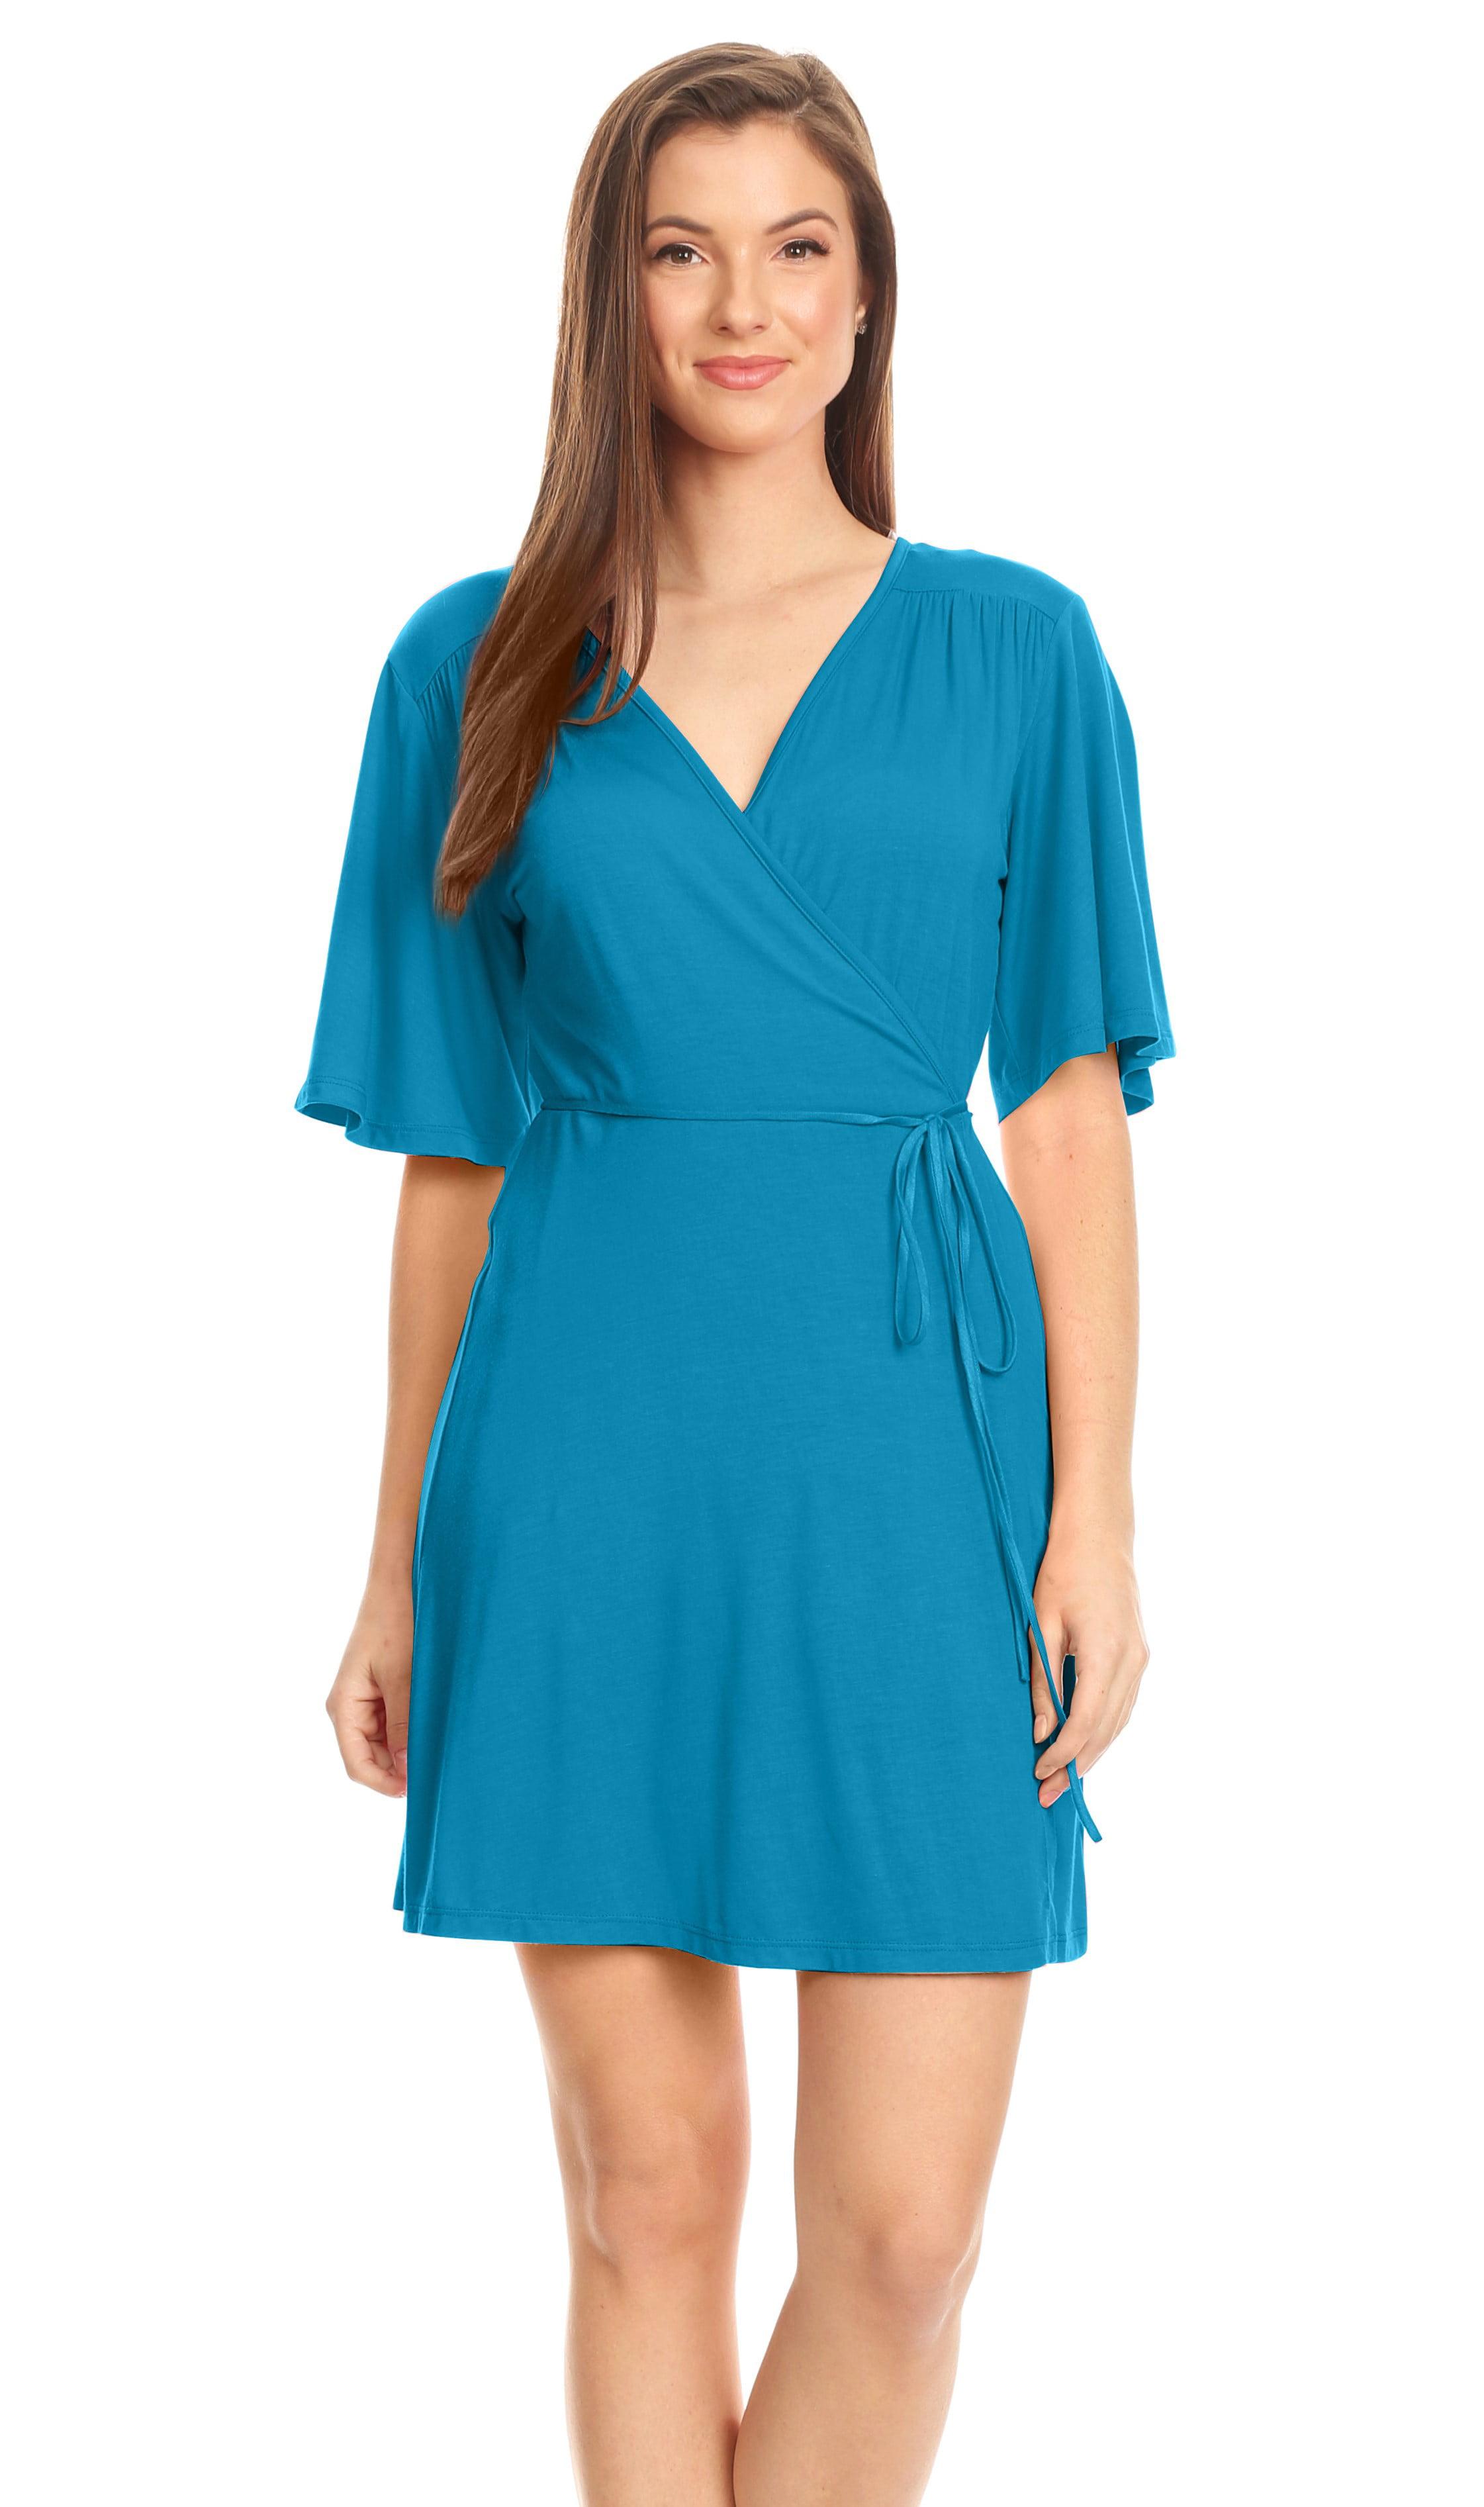 Simlu - Women\'s Wrap Dress Flared Sleeve Reg and Plus Size Wrap ...